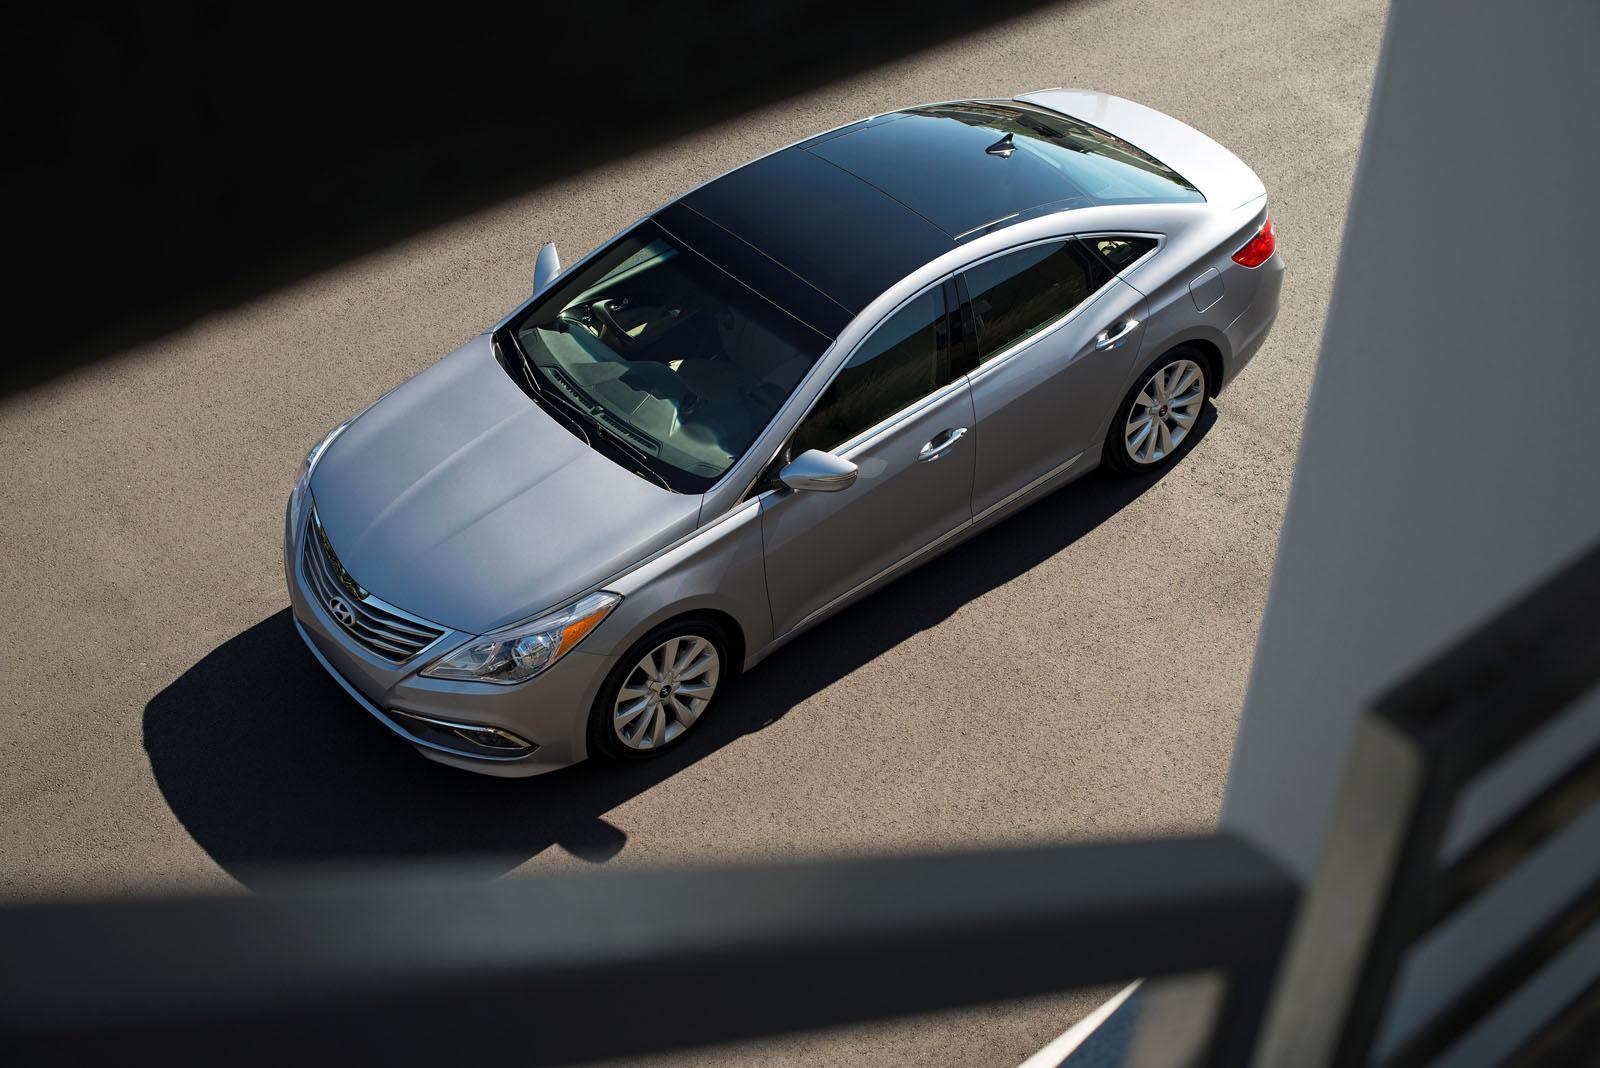 2015 Hyundai Azera Facelift Returns With New Details ...